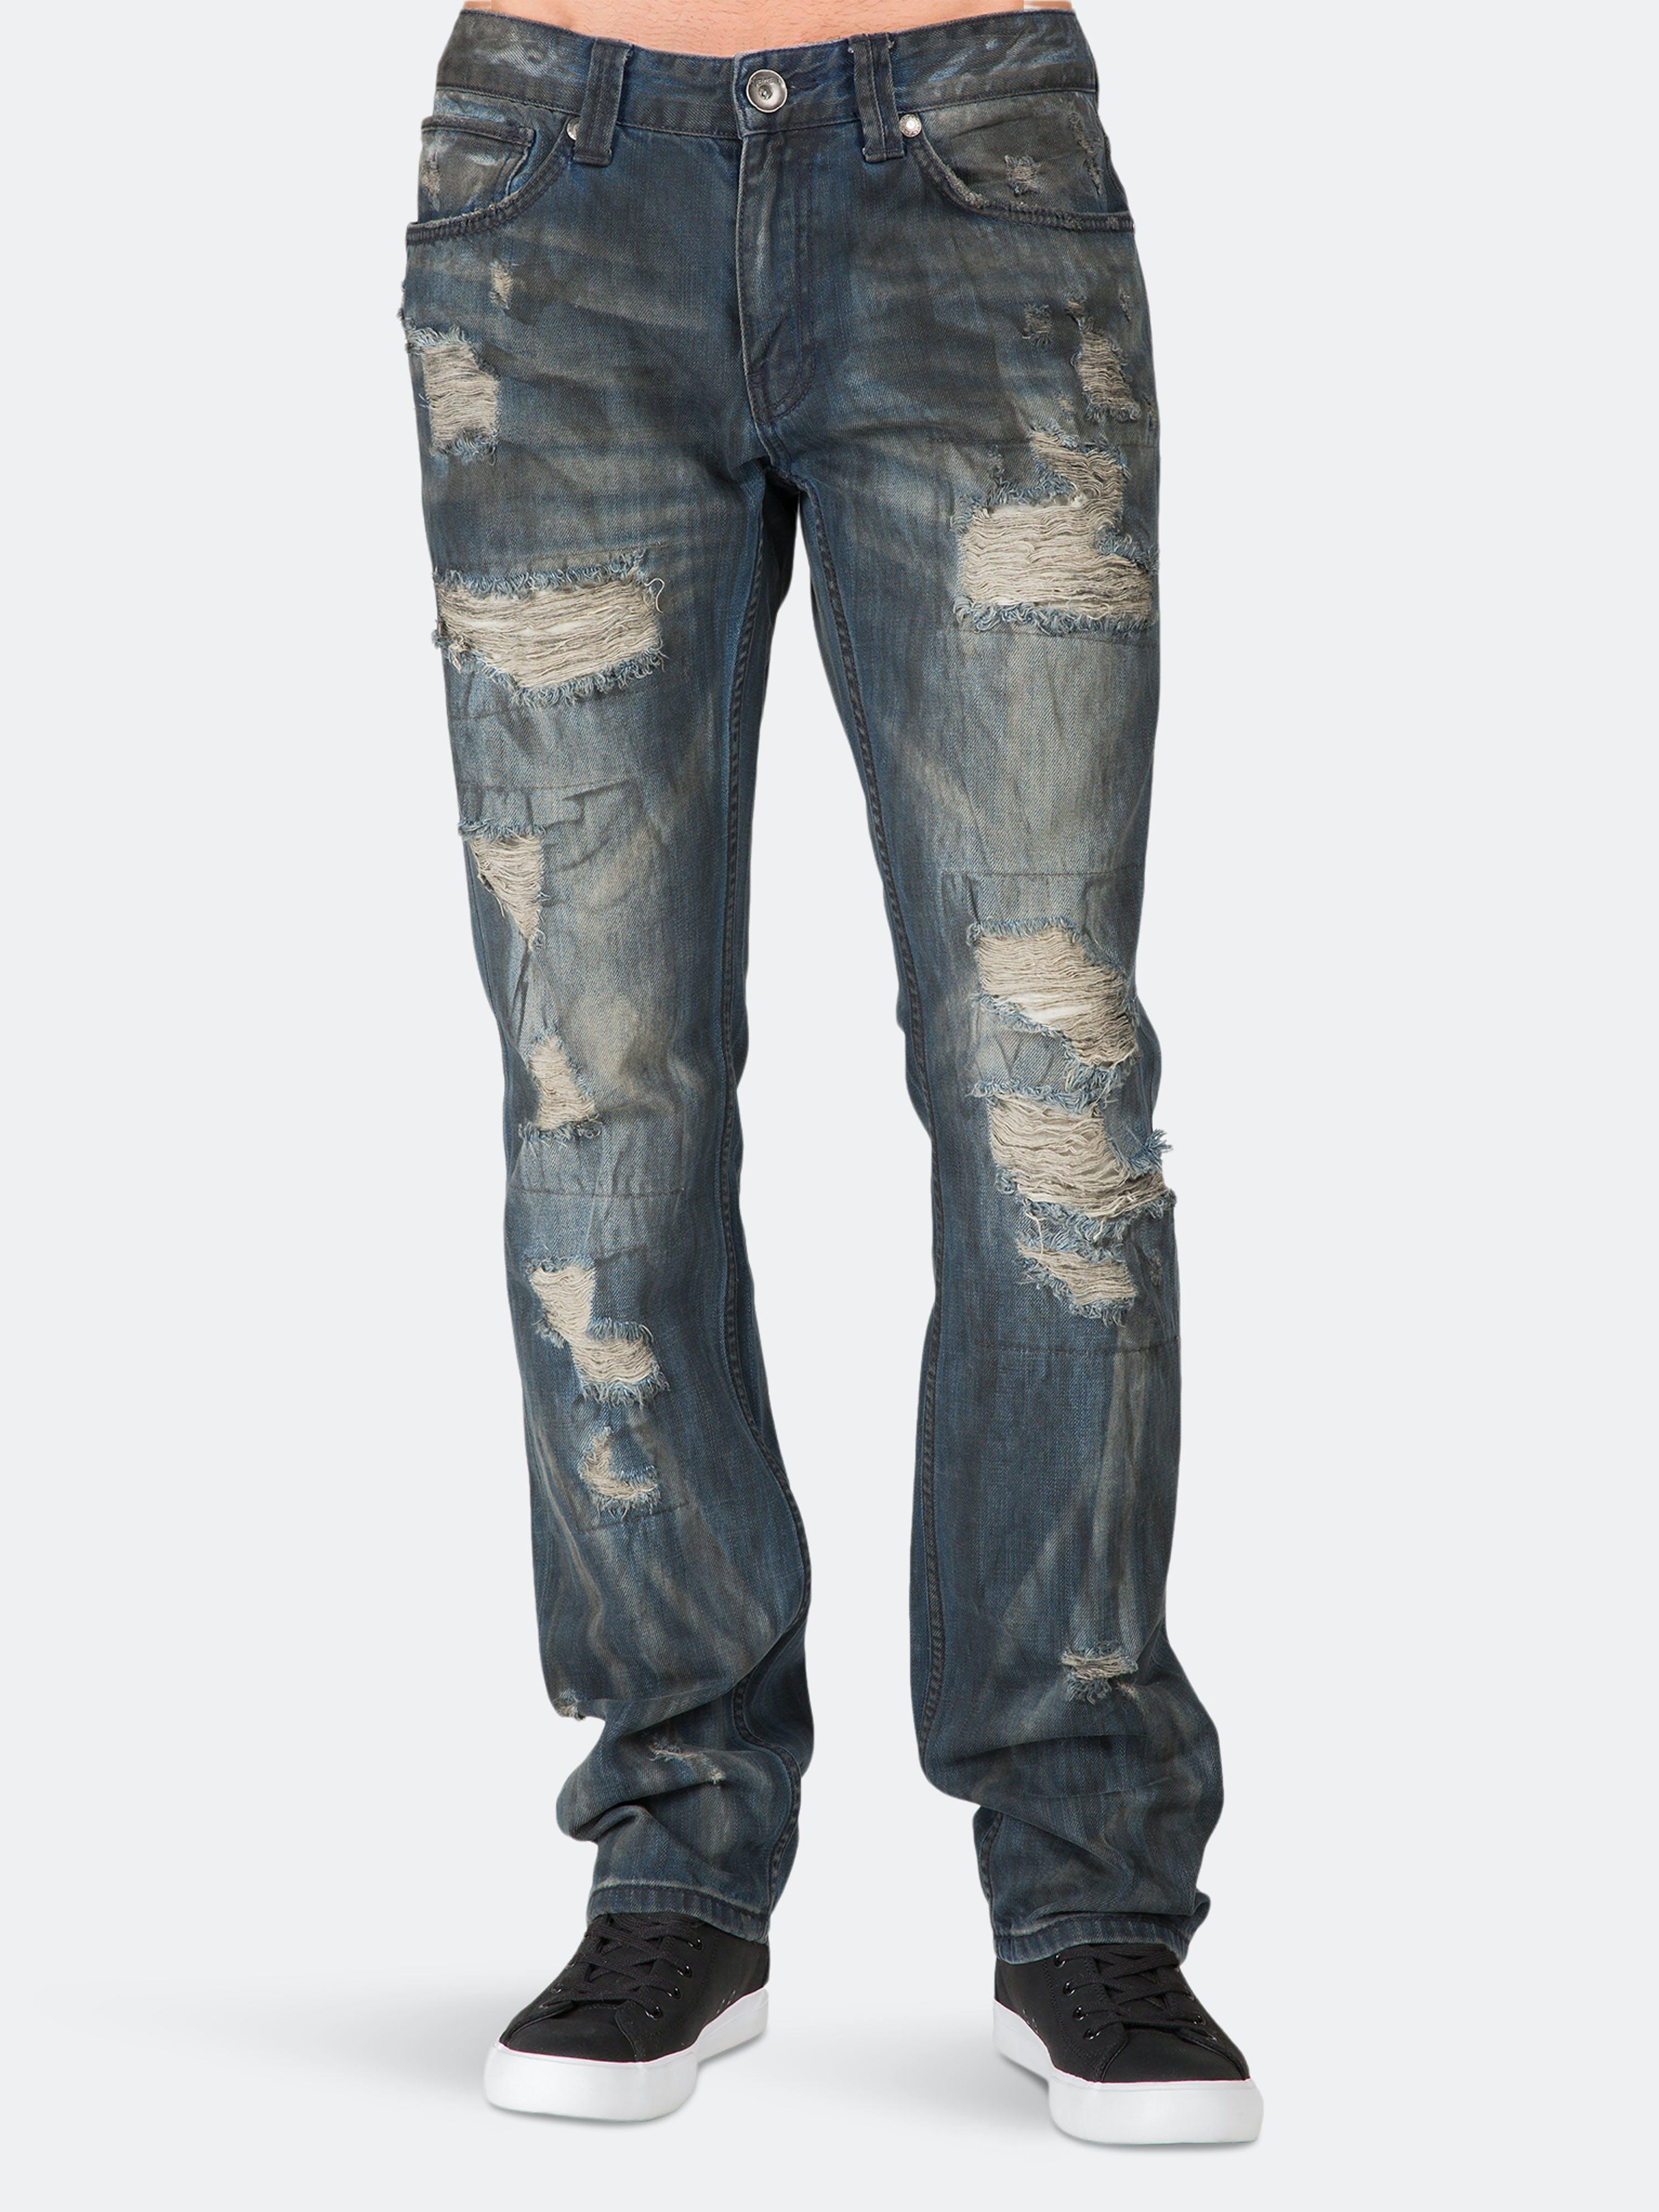 Level 7 Premium Jeans Slim Straight Black Tint Destroyed & Mended In Blue